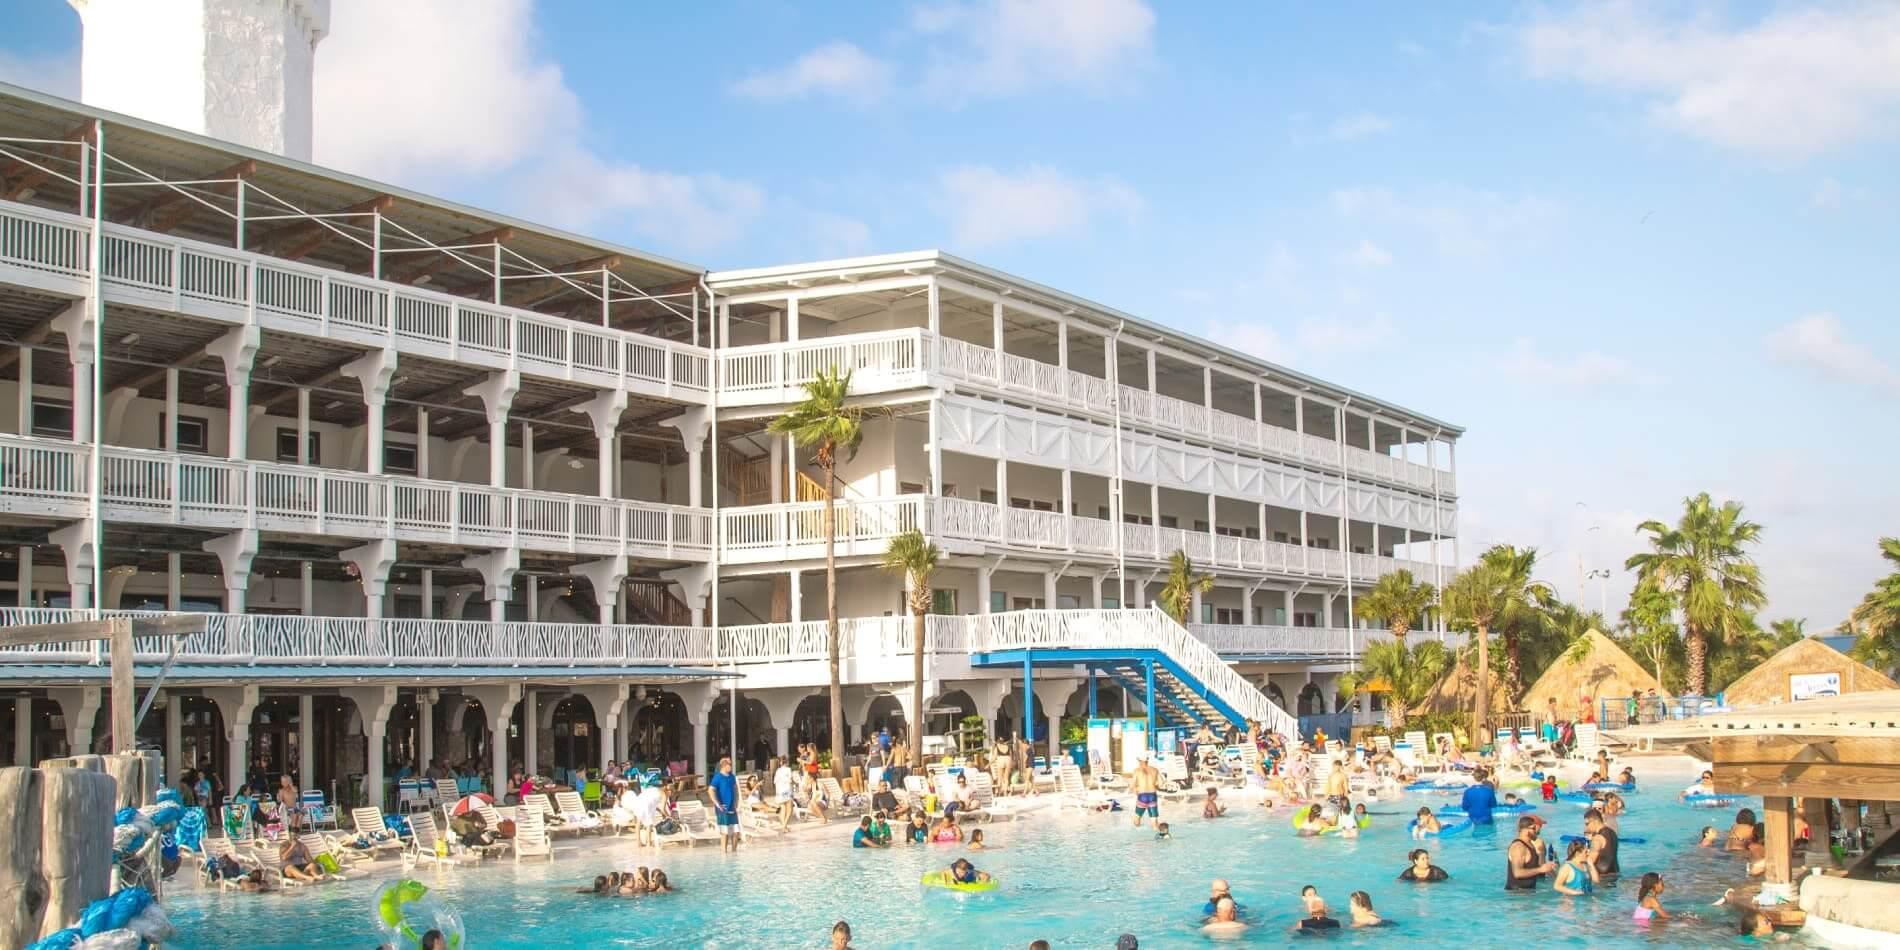 Benchmark adds Waves Resort Corpus Christi to management portfolio